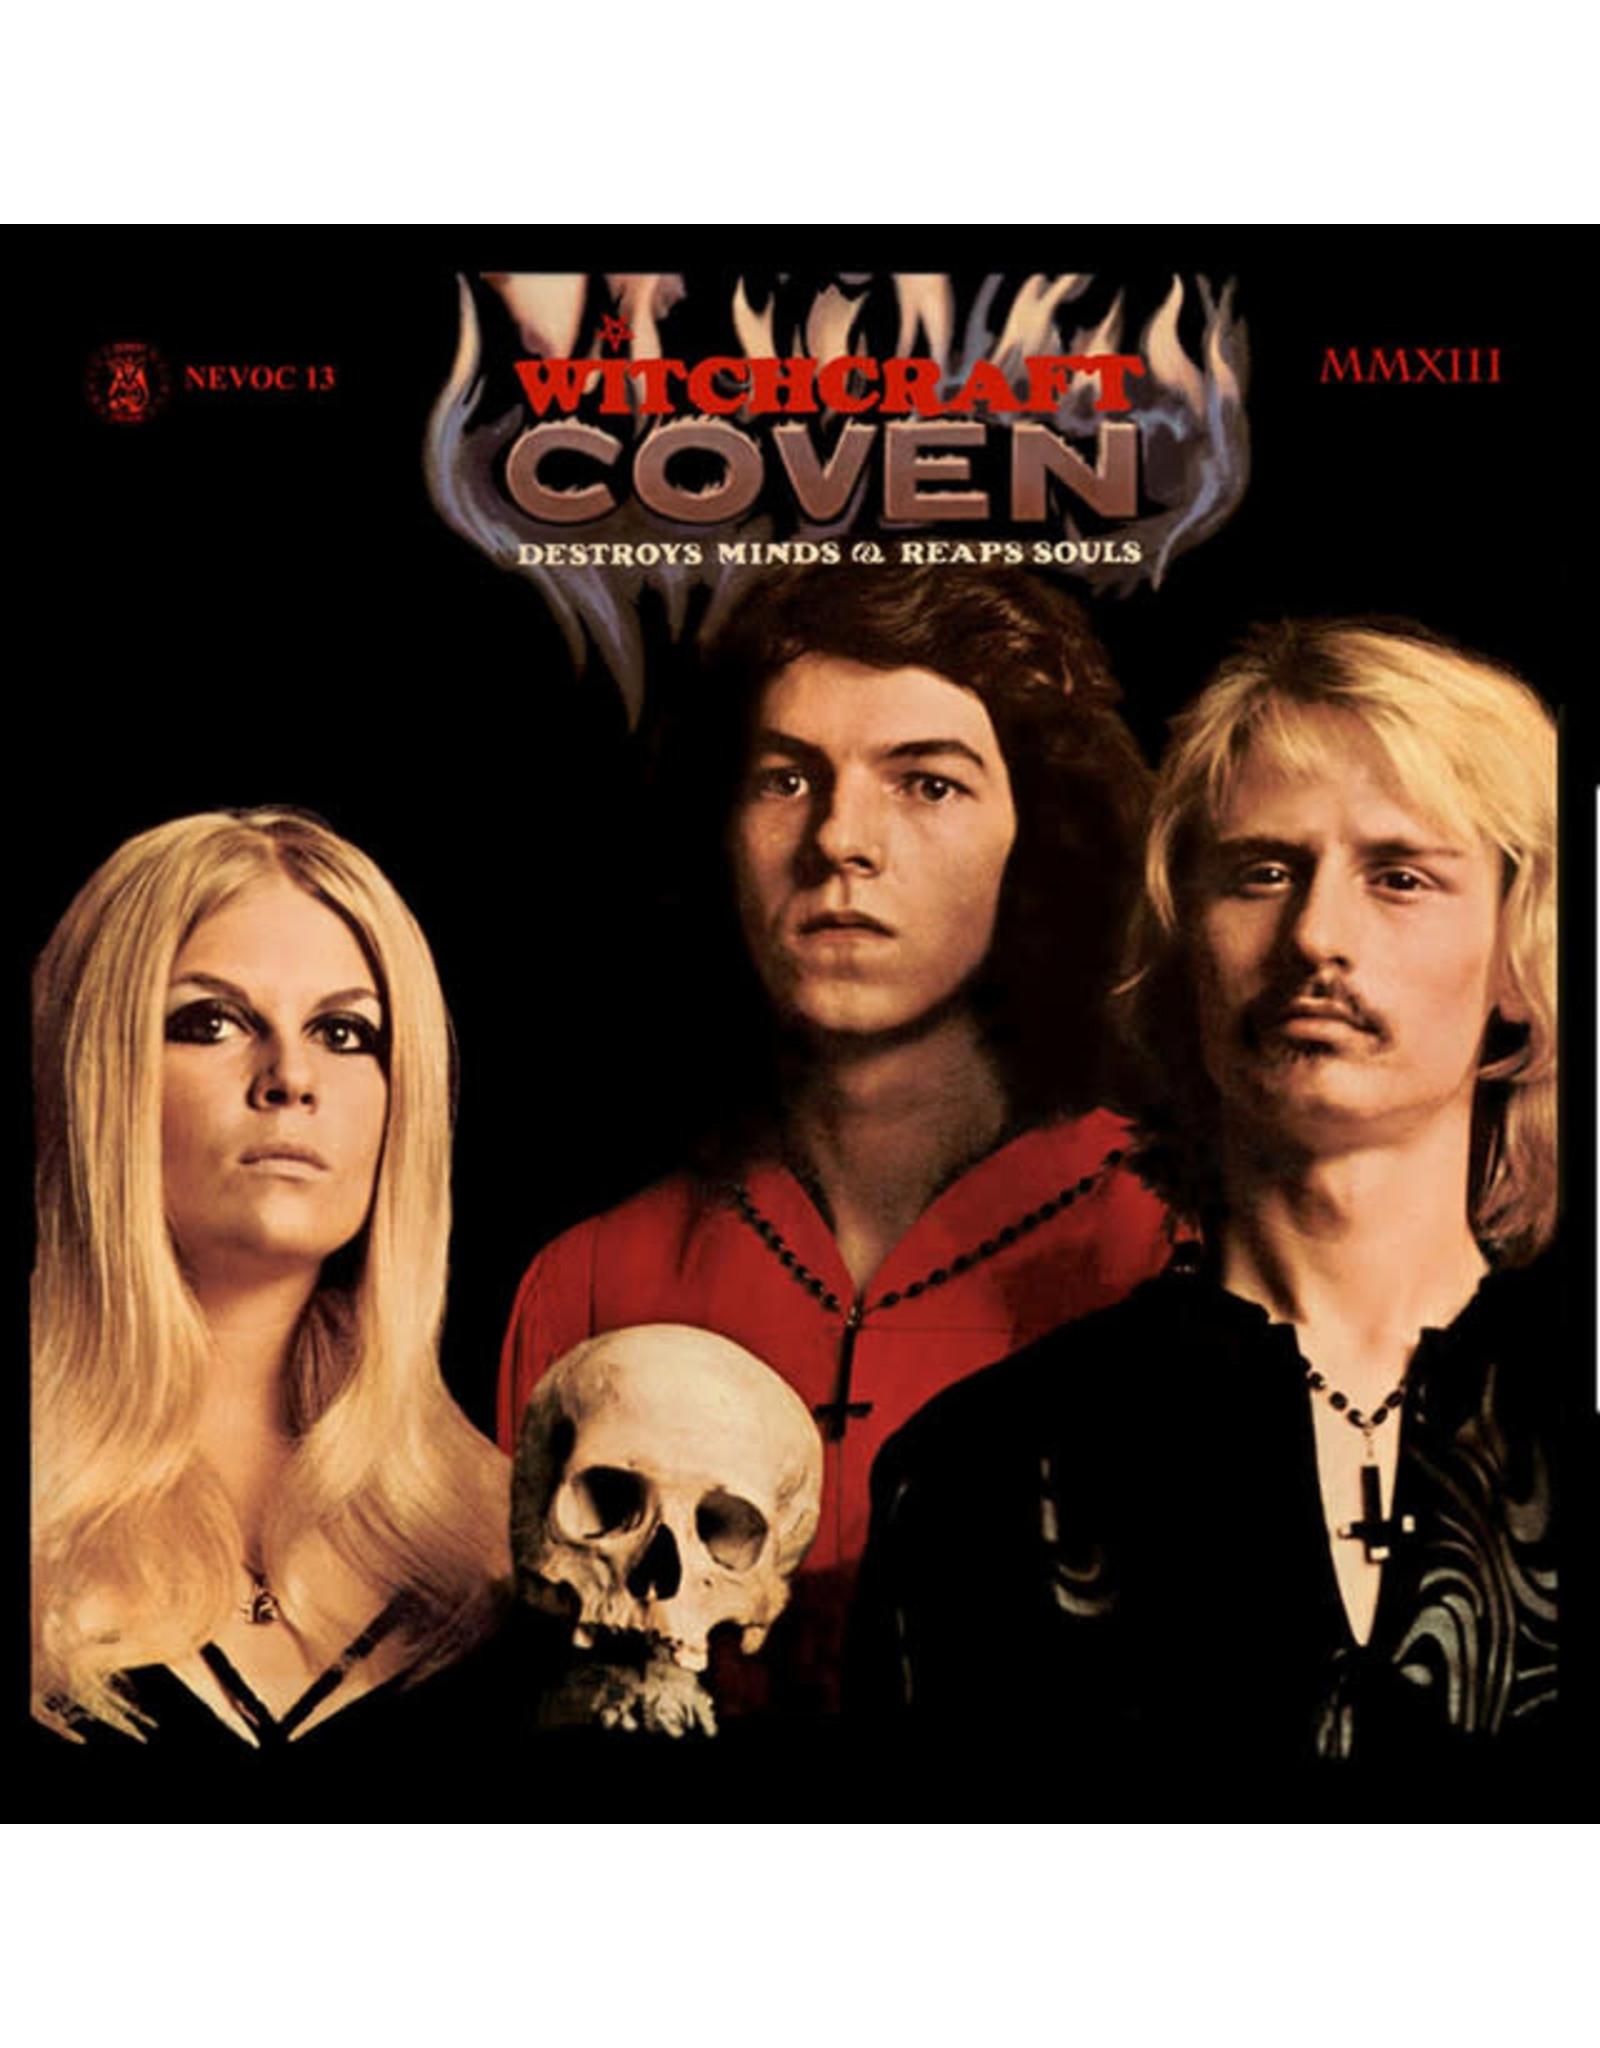 Vinyl Coven - Witchcraft